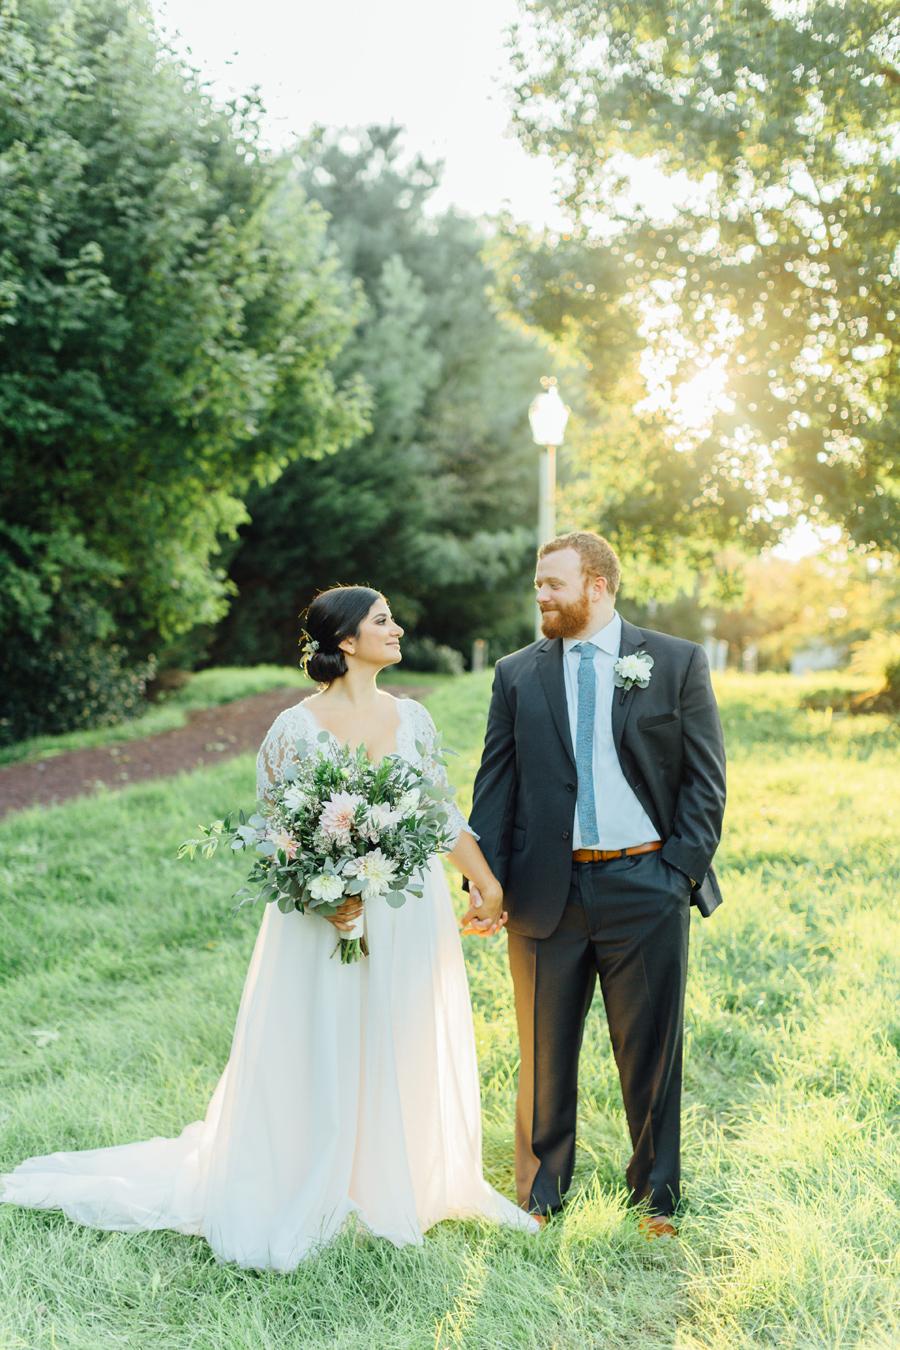 the-inn-at-leola-wedding-lancaster-pennsylvania-wedding-photographer-rebeka-viola-photograhy (75).jpg